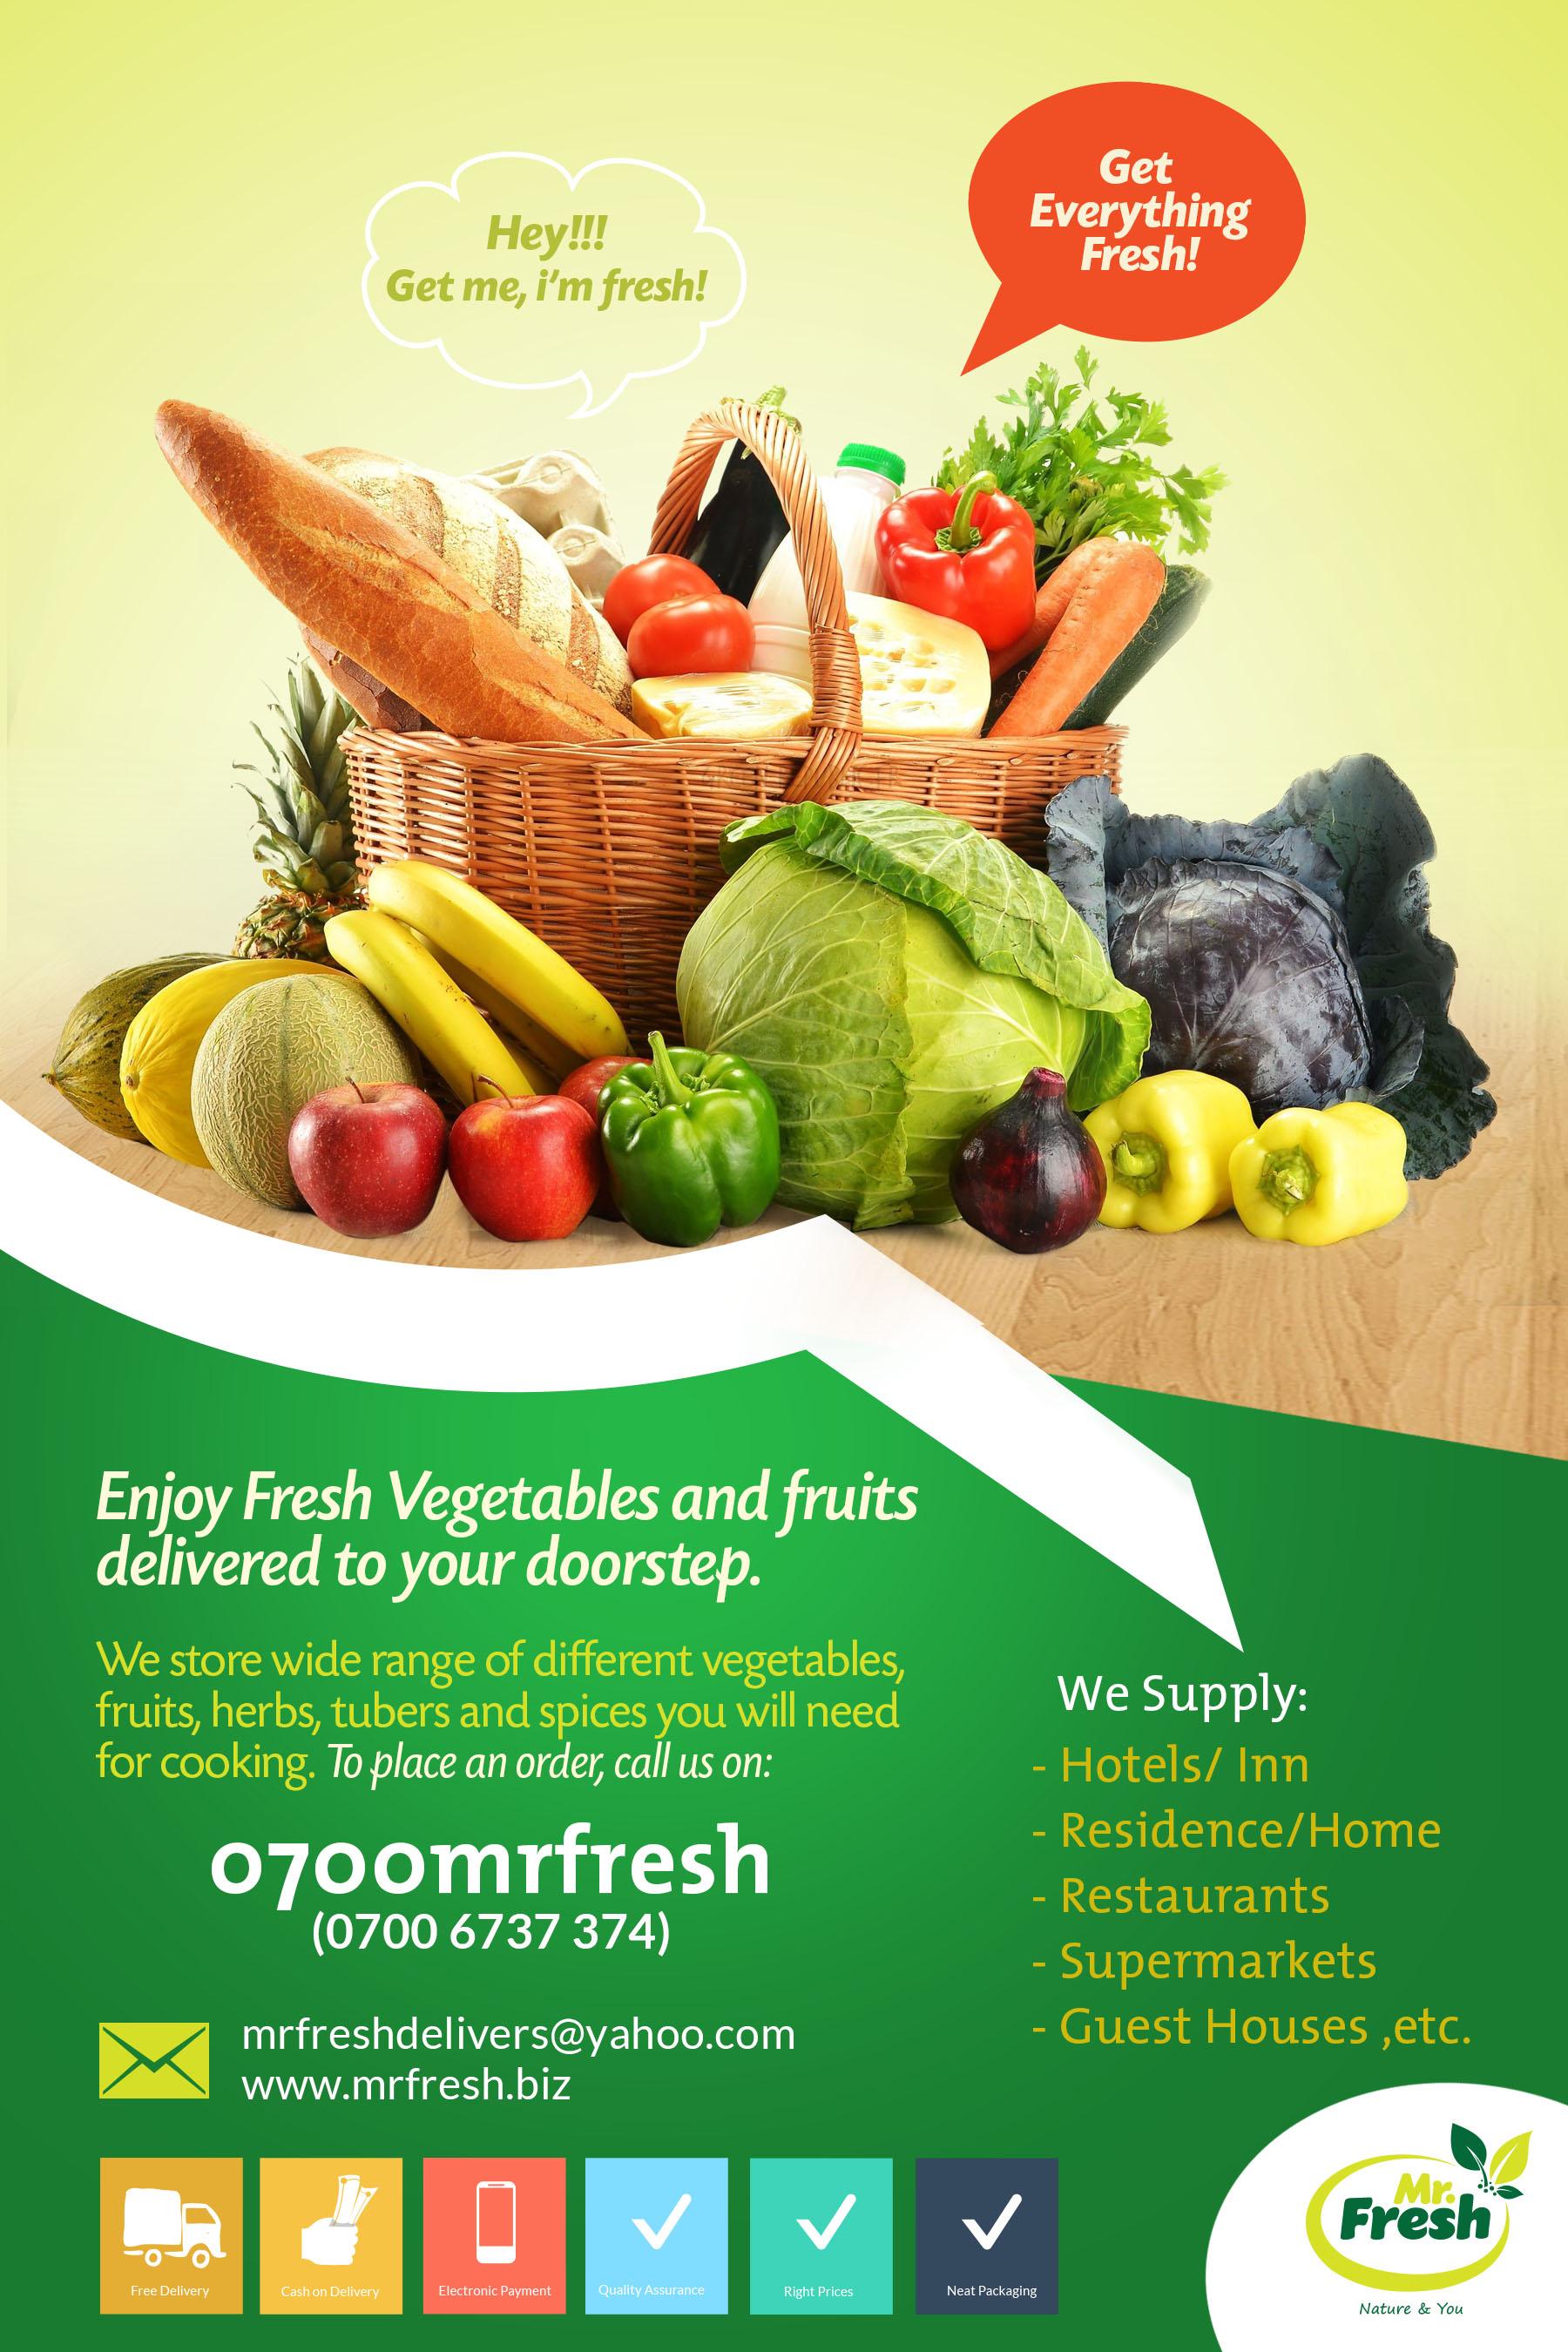 Mr FreshGoodies Nigeria Limited